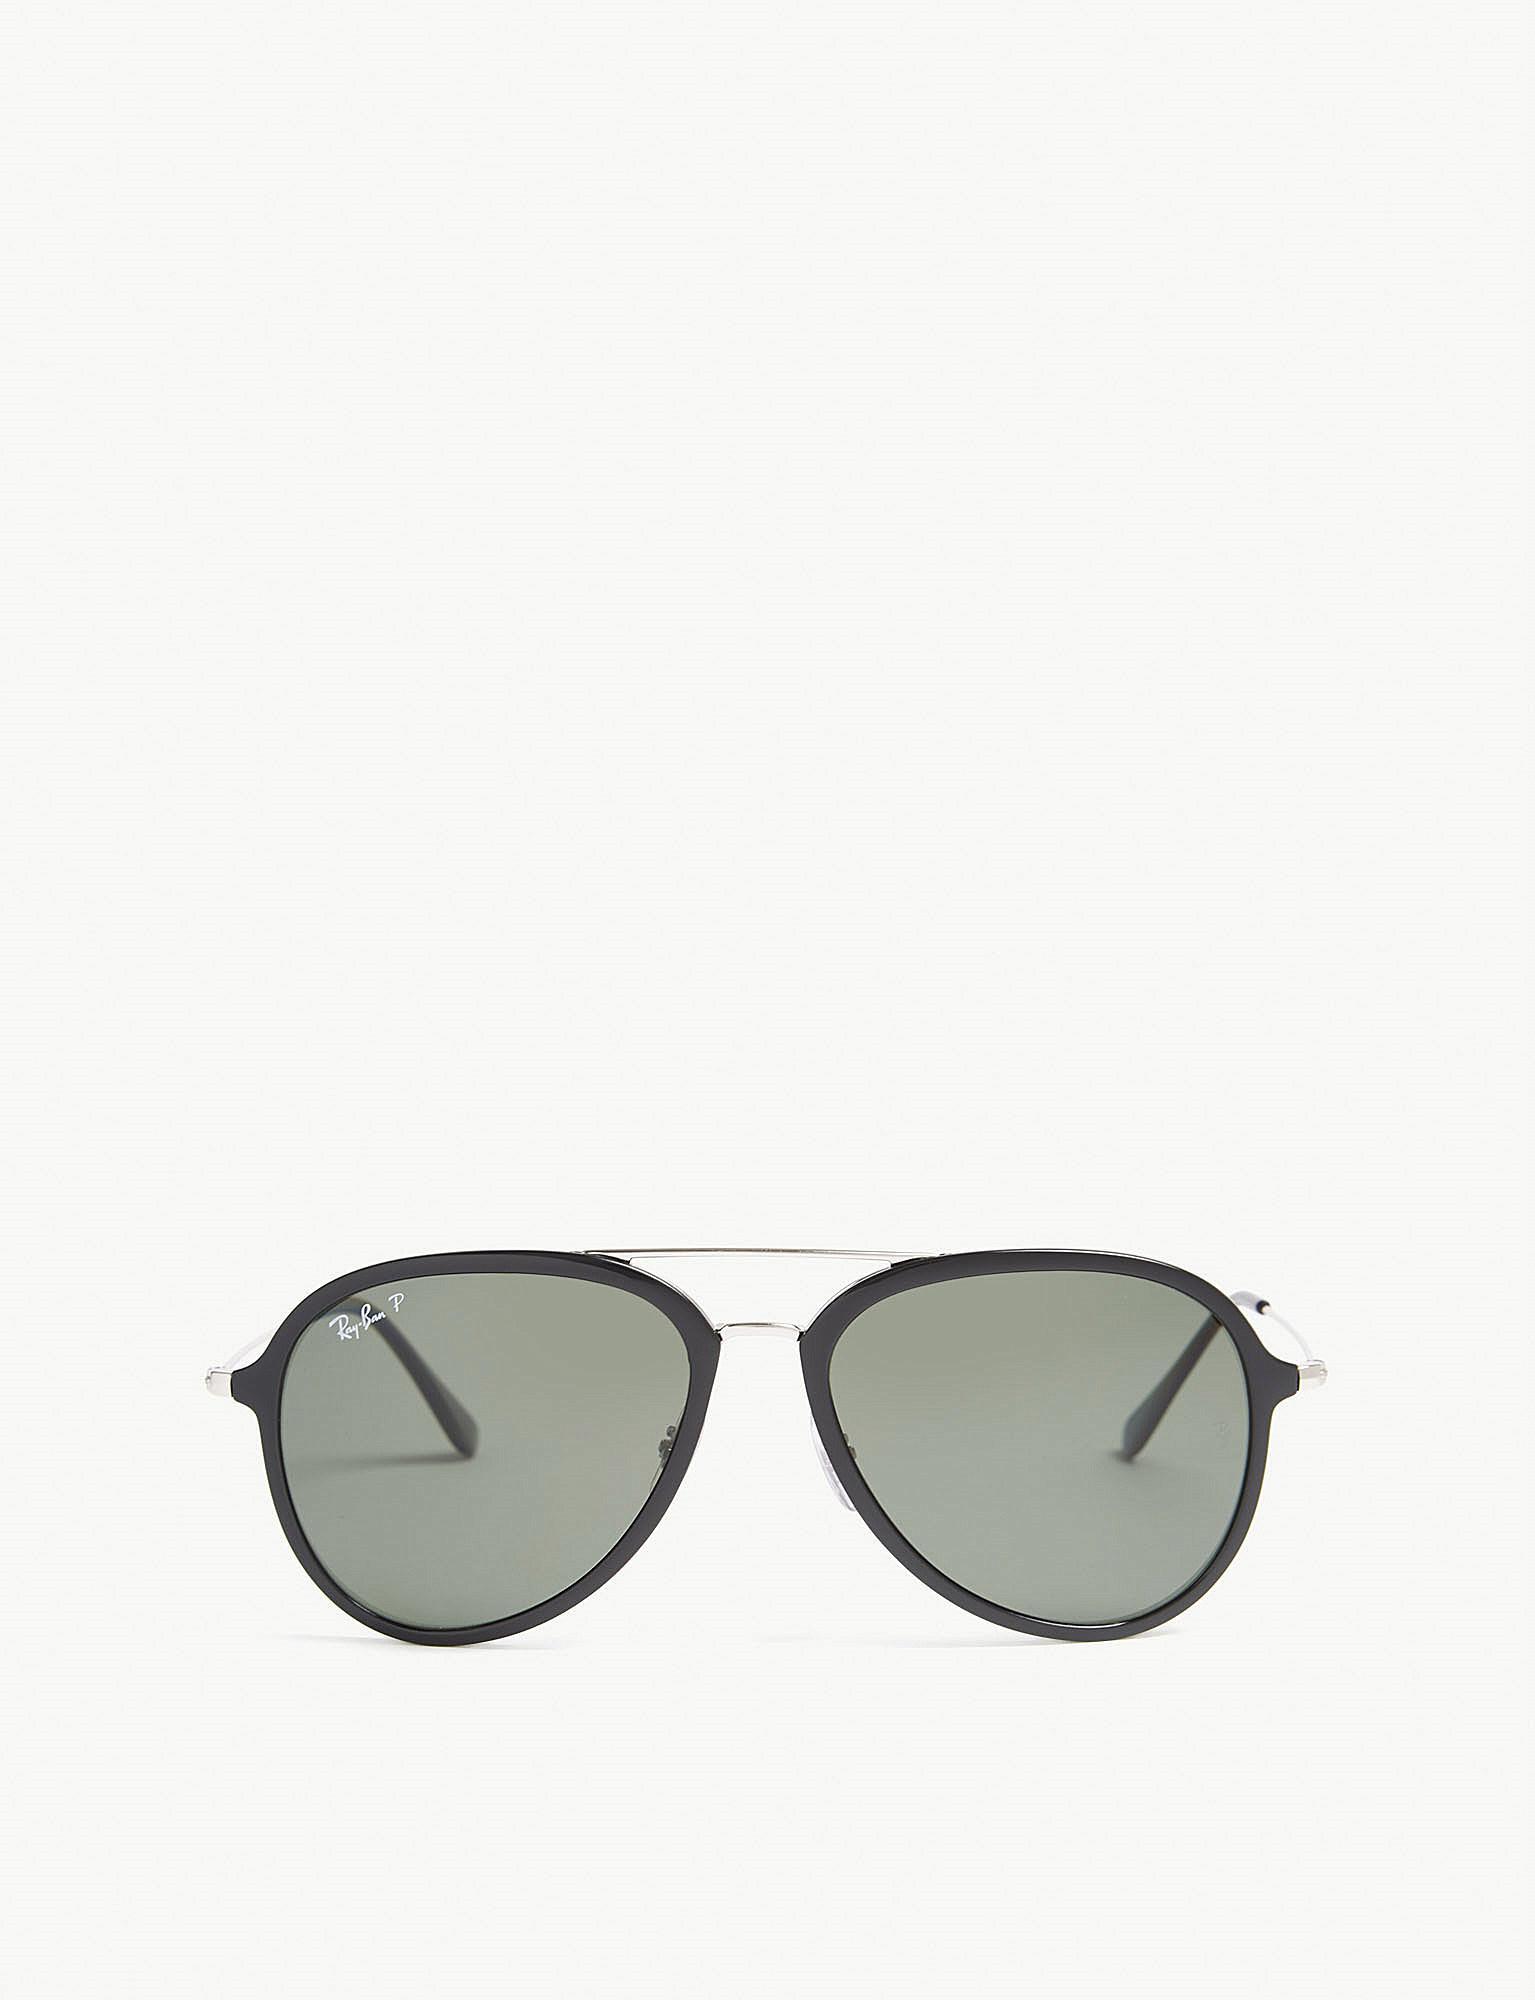 ce6ca72e3e Lyst - Ray-Ban Rb4298 Pilot-frame Sunglasses in Black